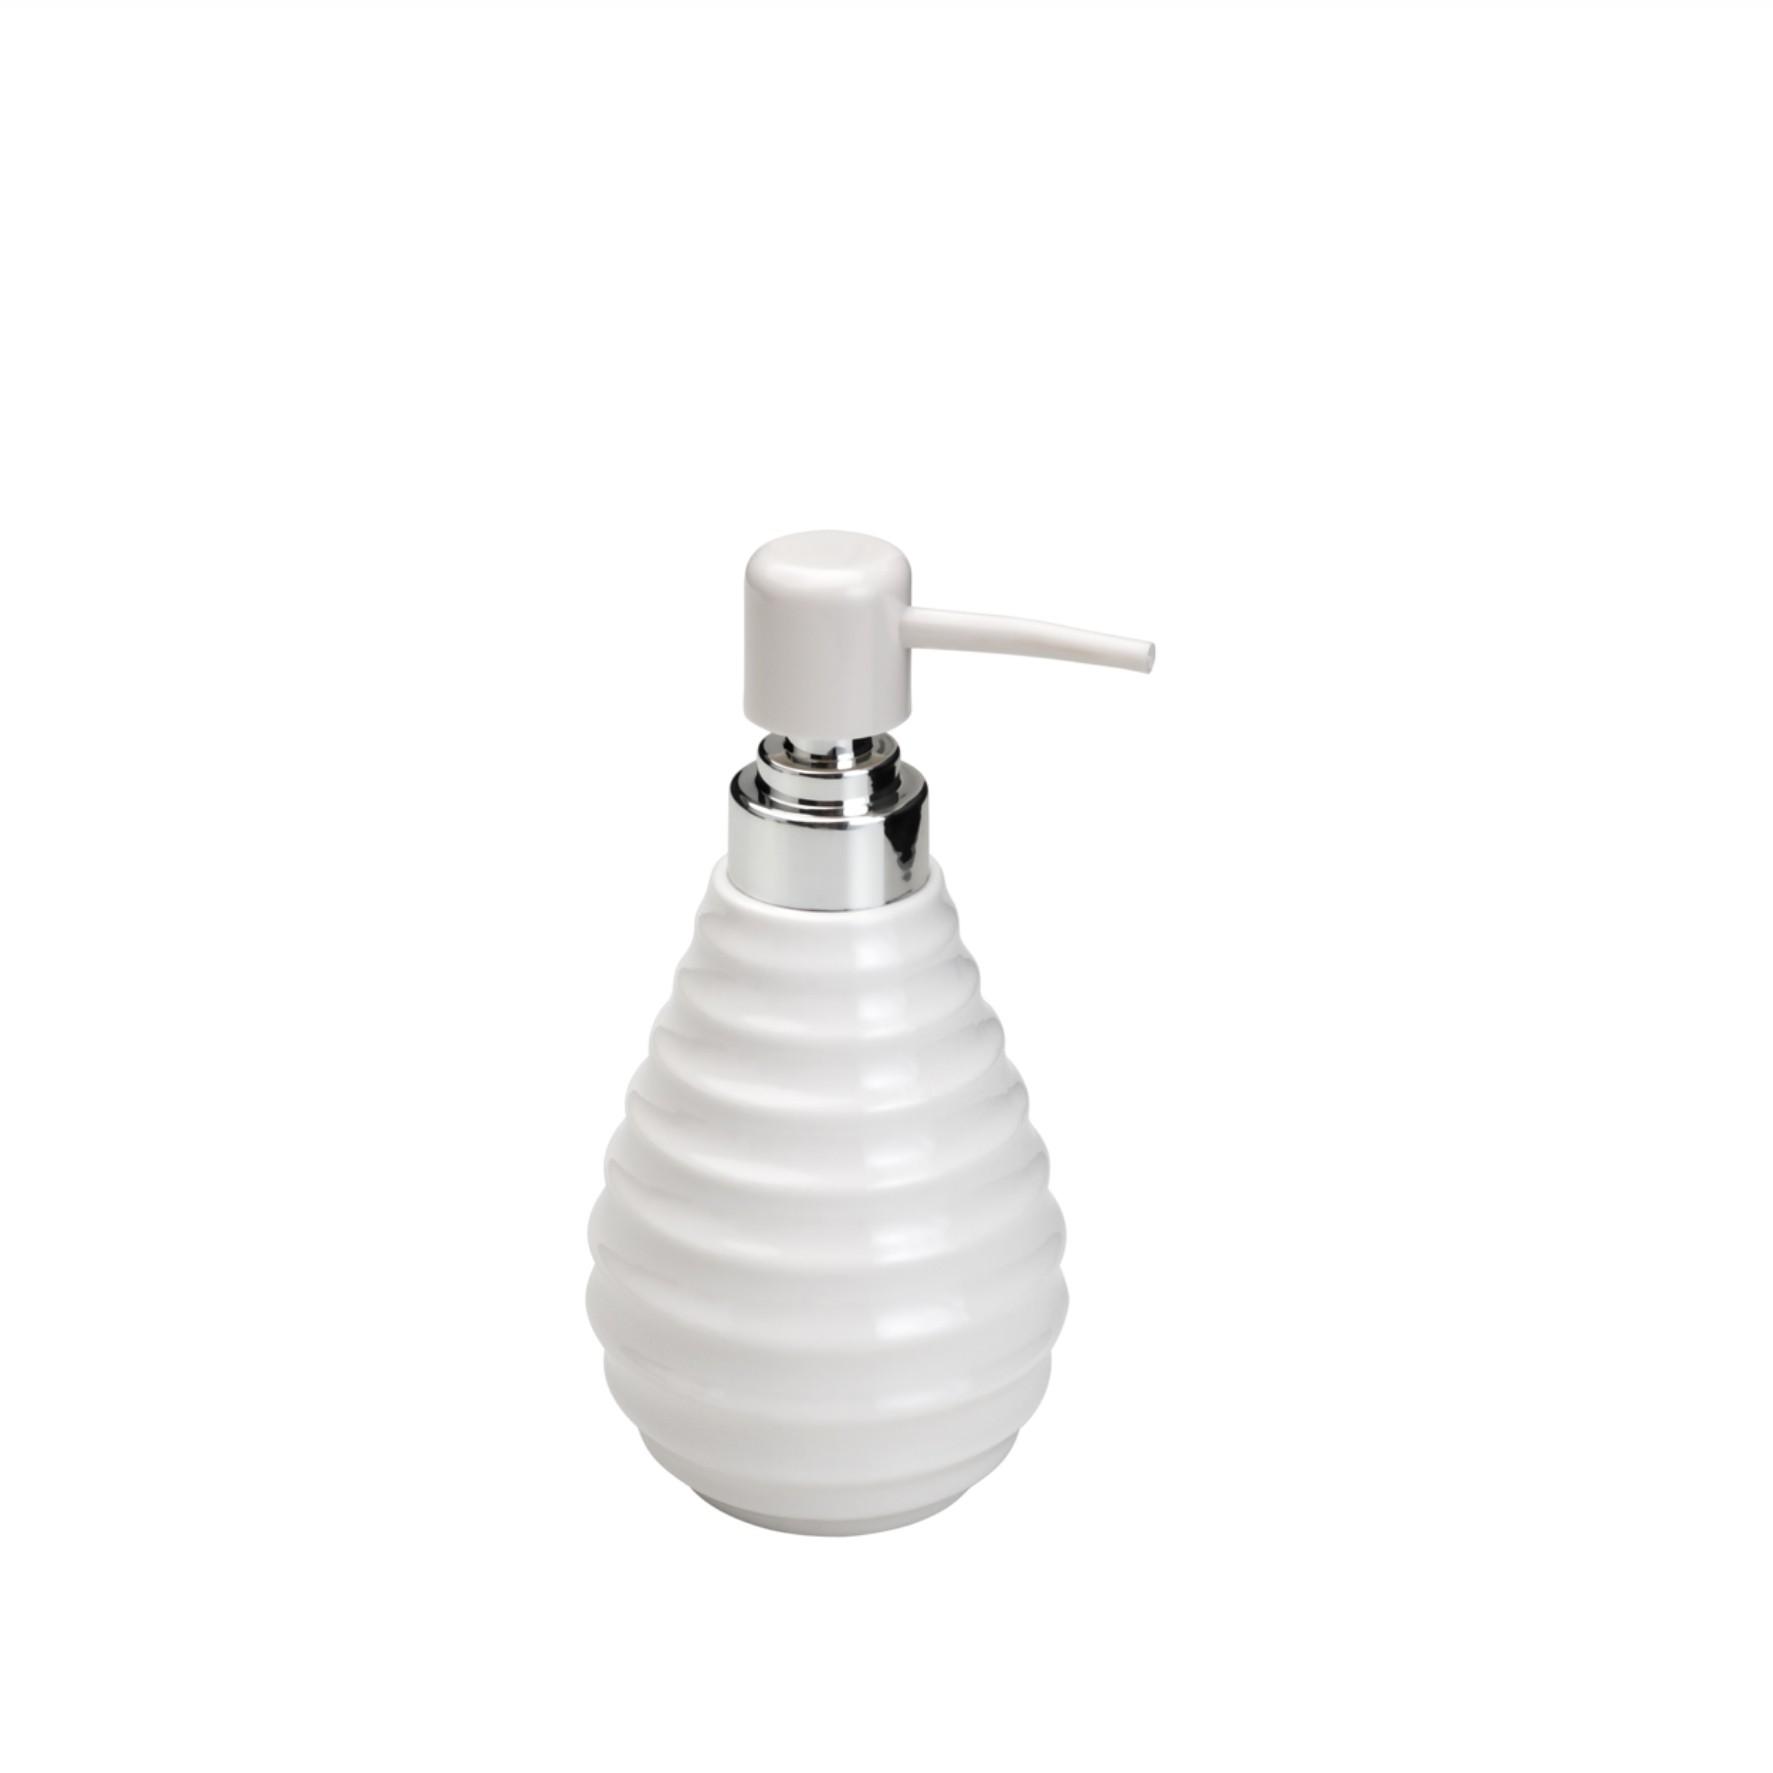 Porta Sabonete Líquido de Cerâmica Prestige 300ml Branco - Rojemac